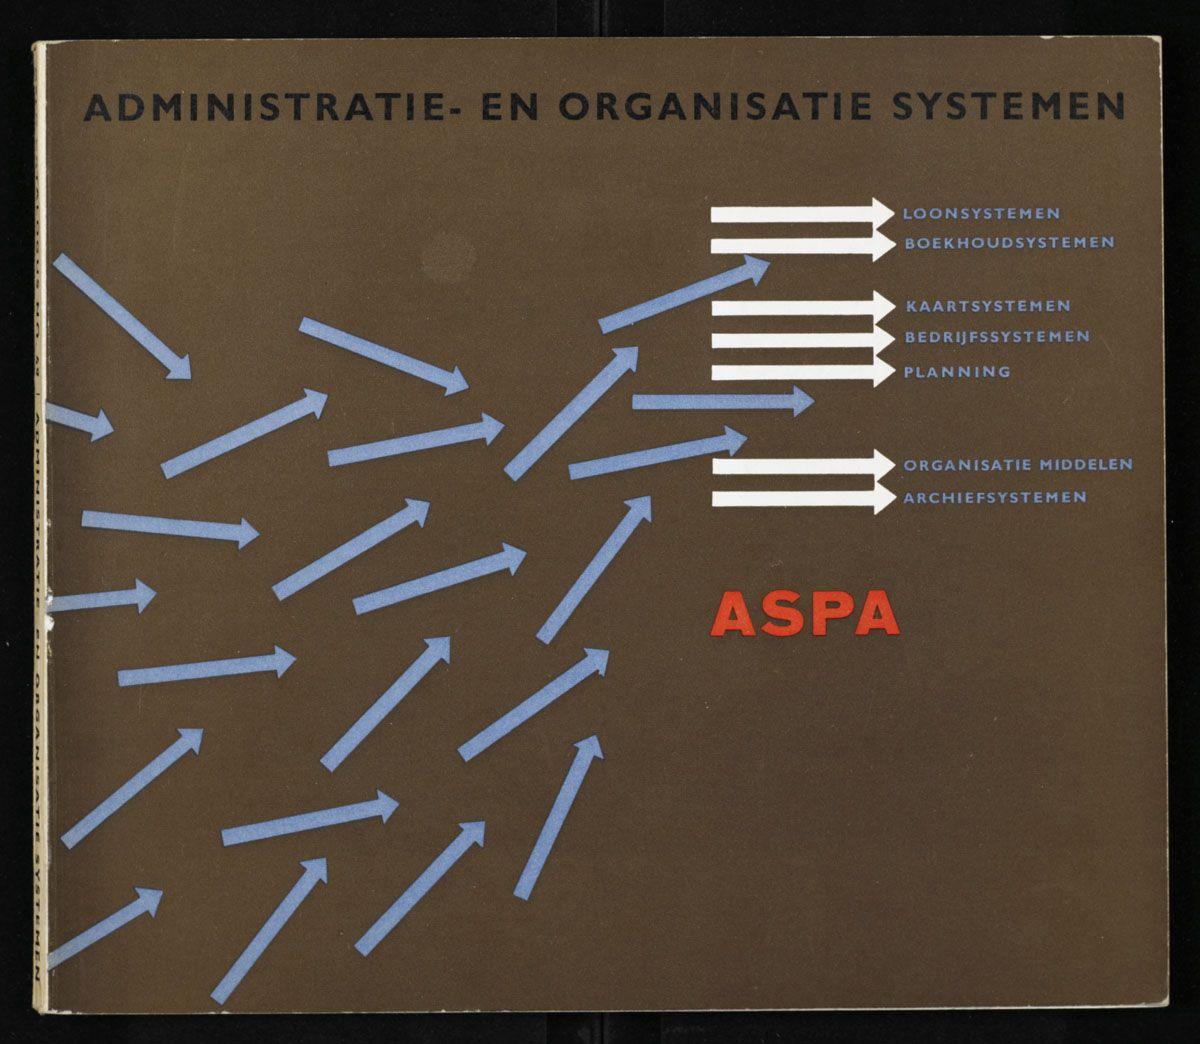 Administratie- en organisatie systemen, Aspa; cover by Jurriaan Schrofer